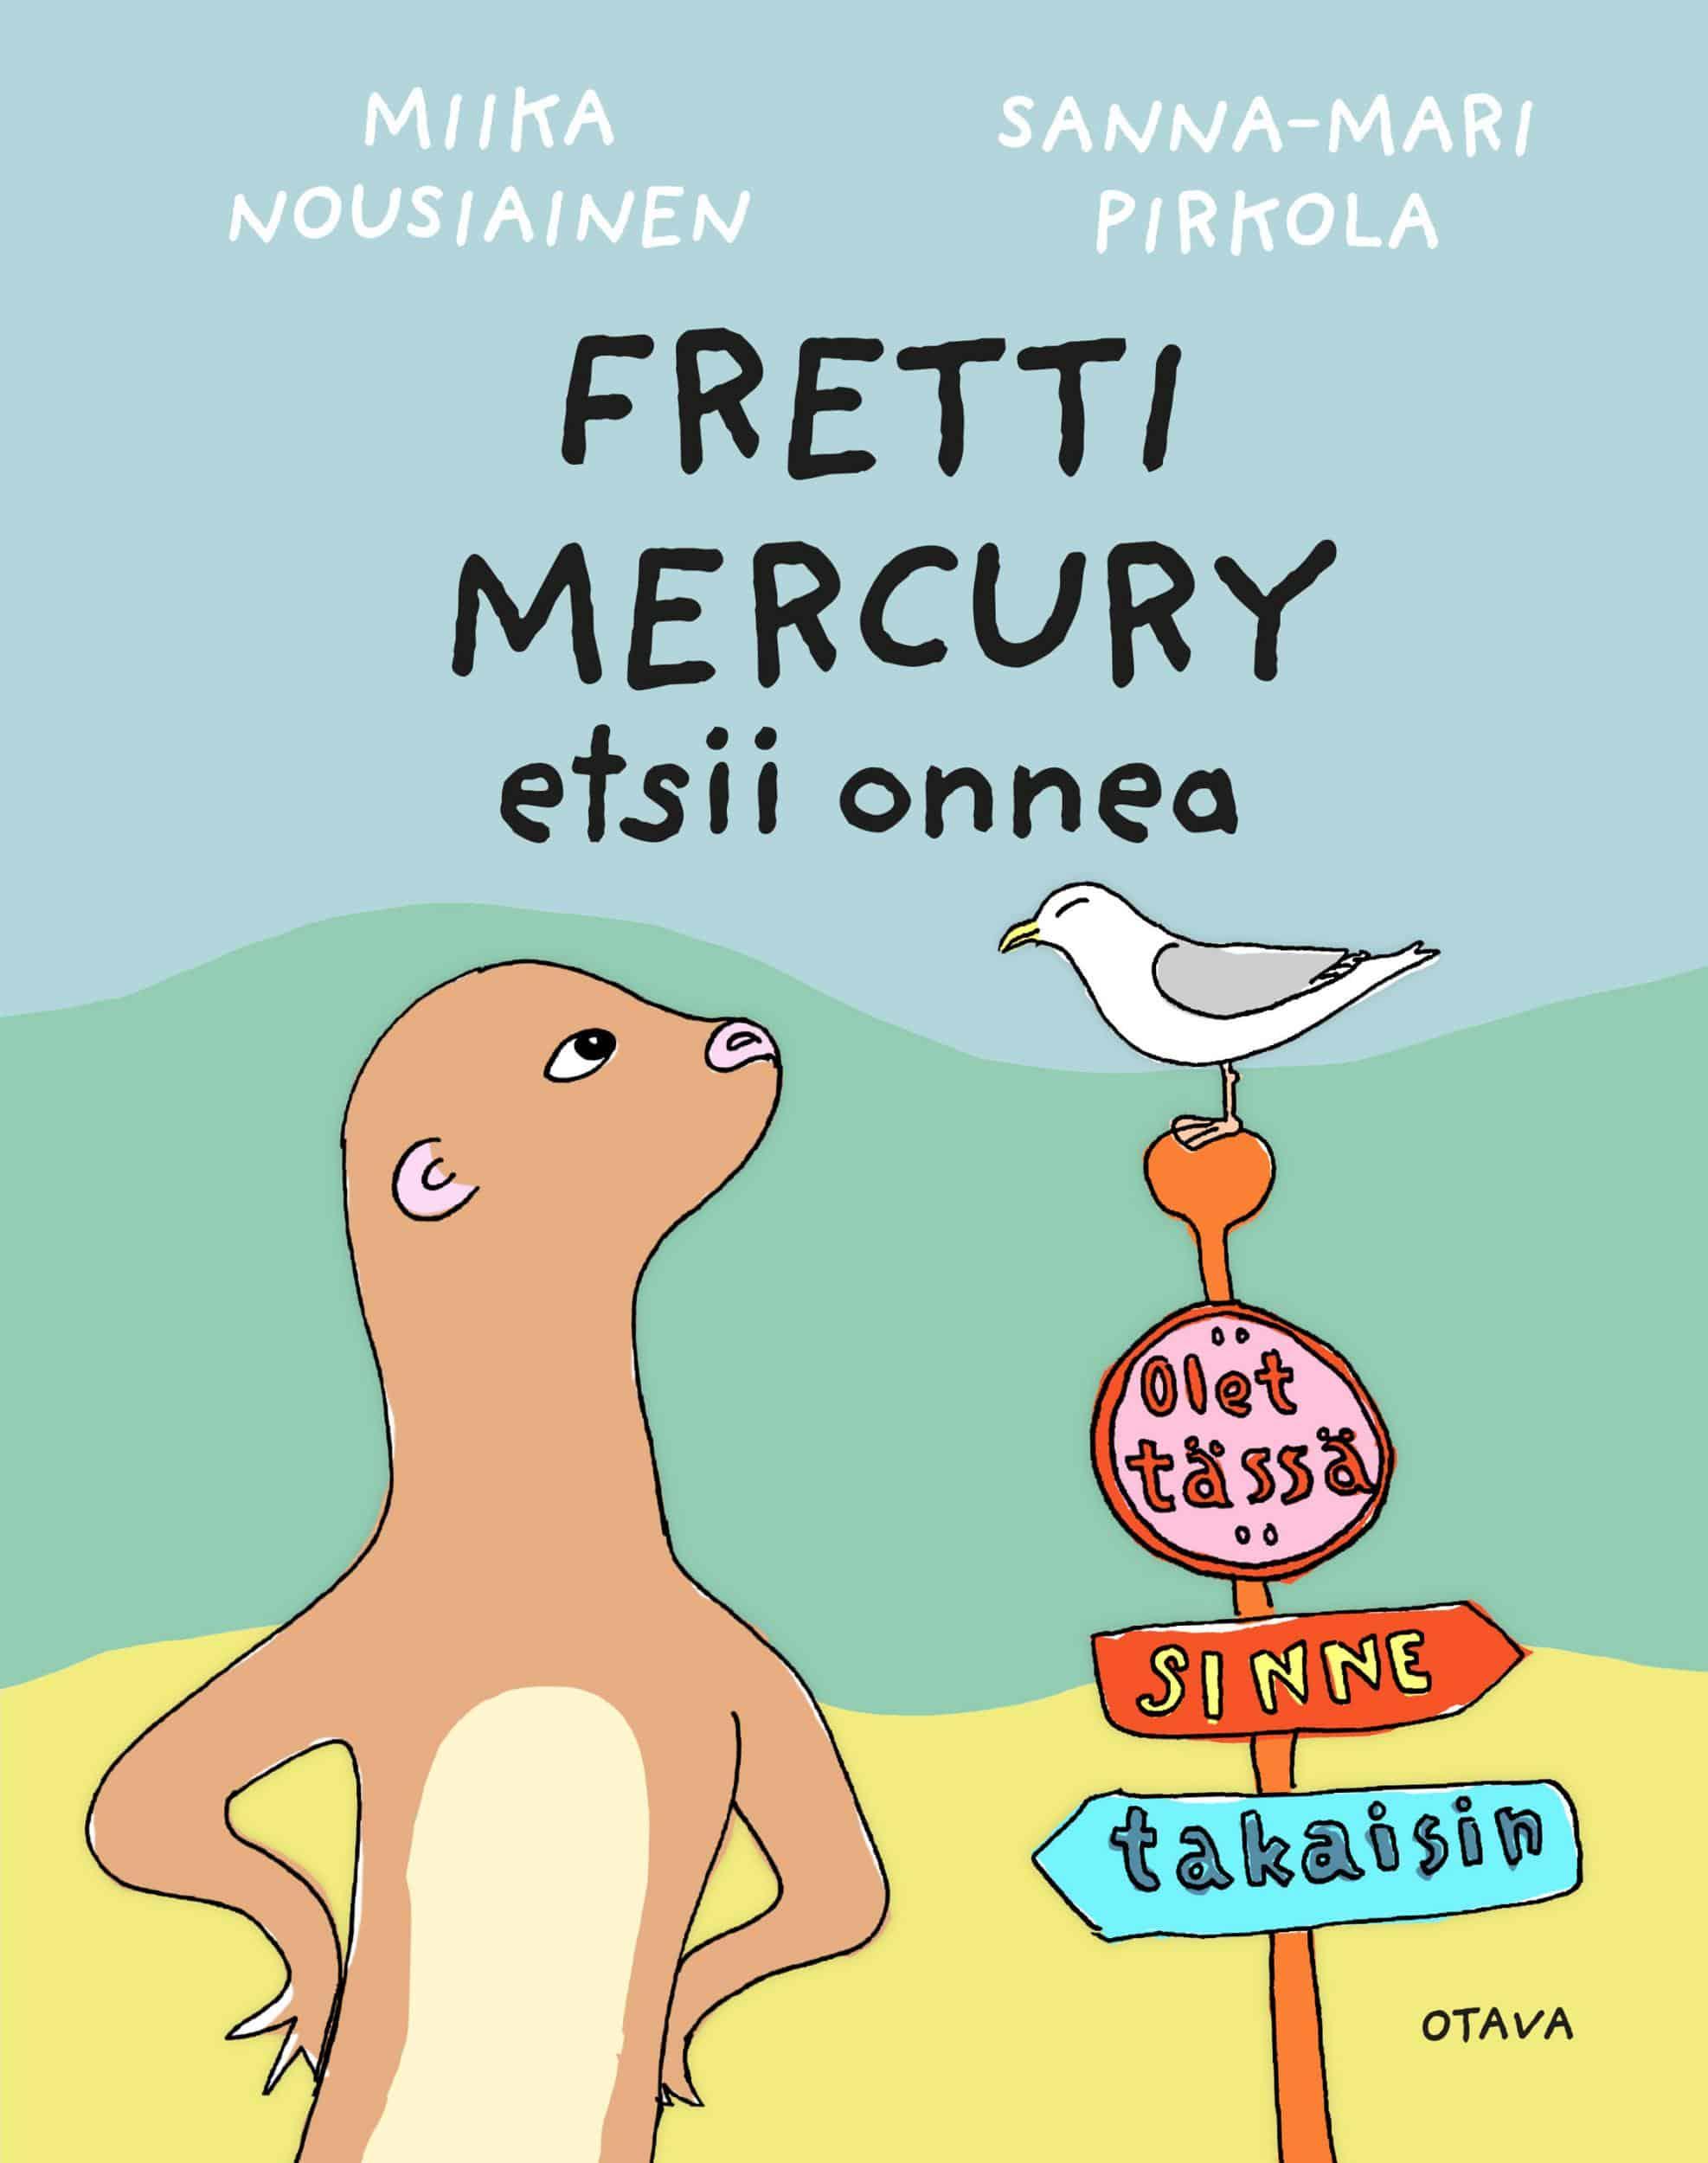 Fretti Mercury etsii onnea